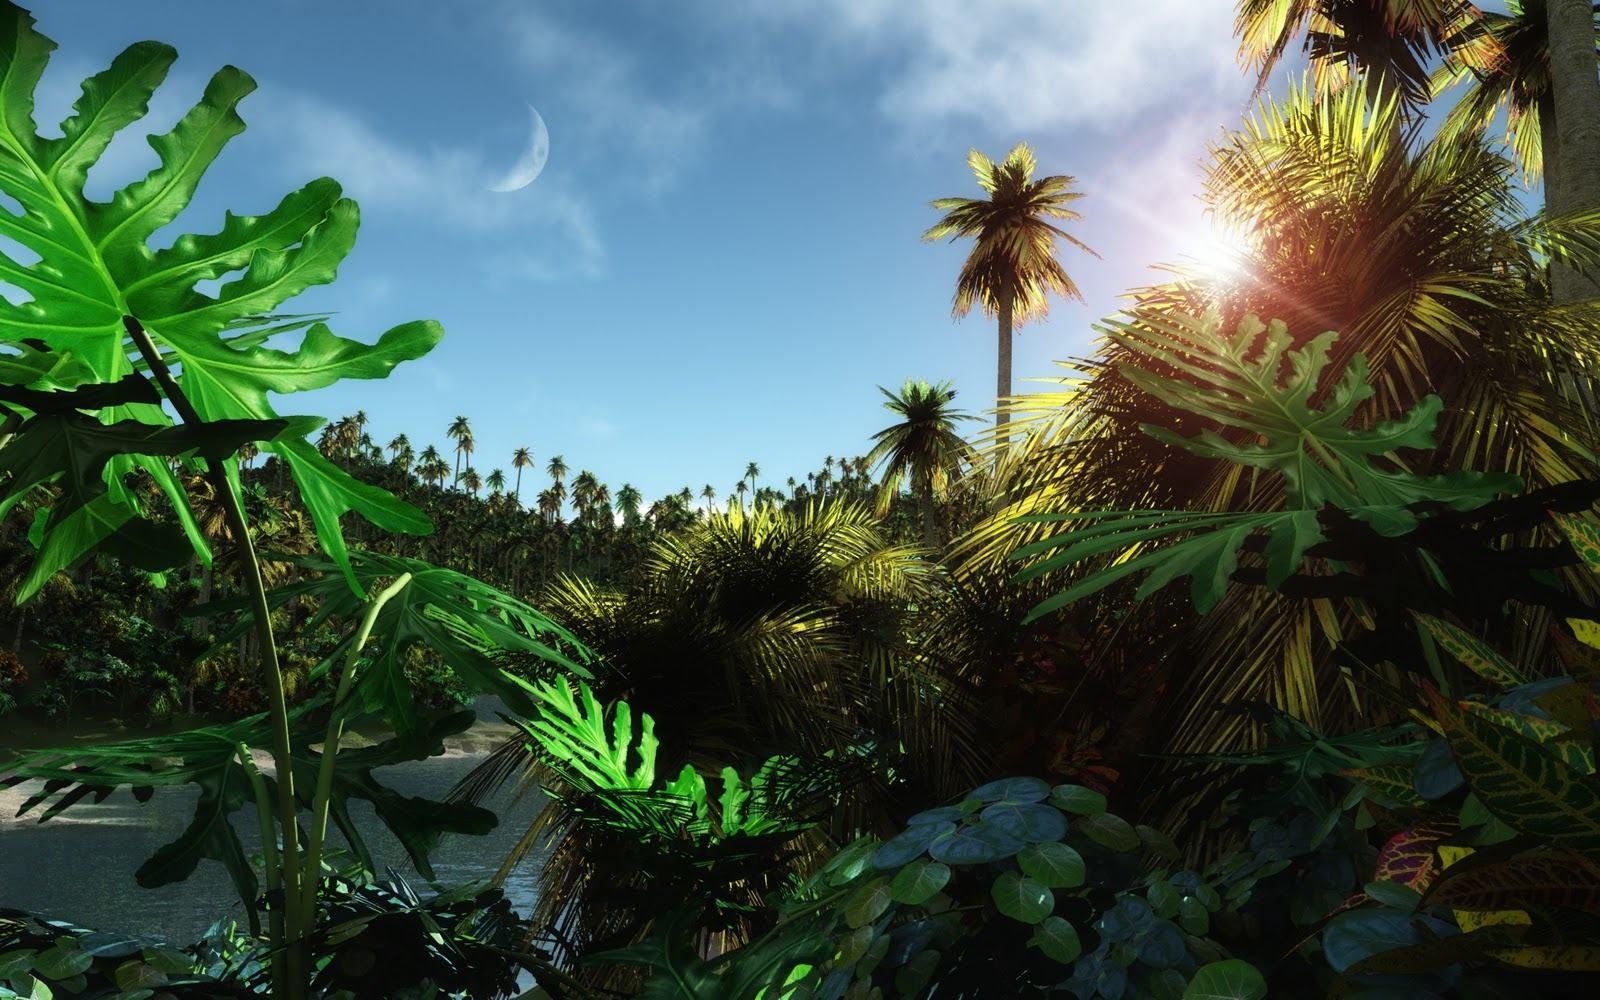 Jungle Desktop Wallpaper HD Wallpapers Backgrounds Jungle   fre 1600x1000